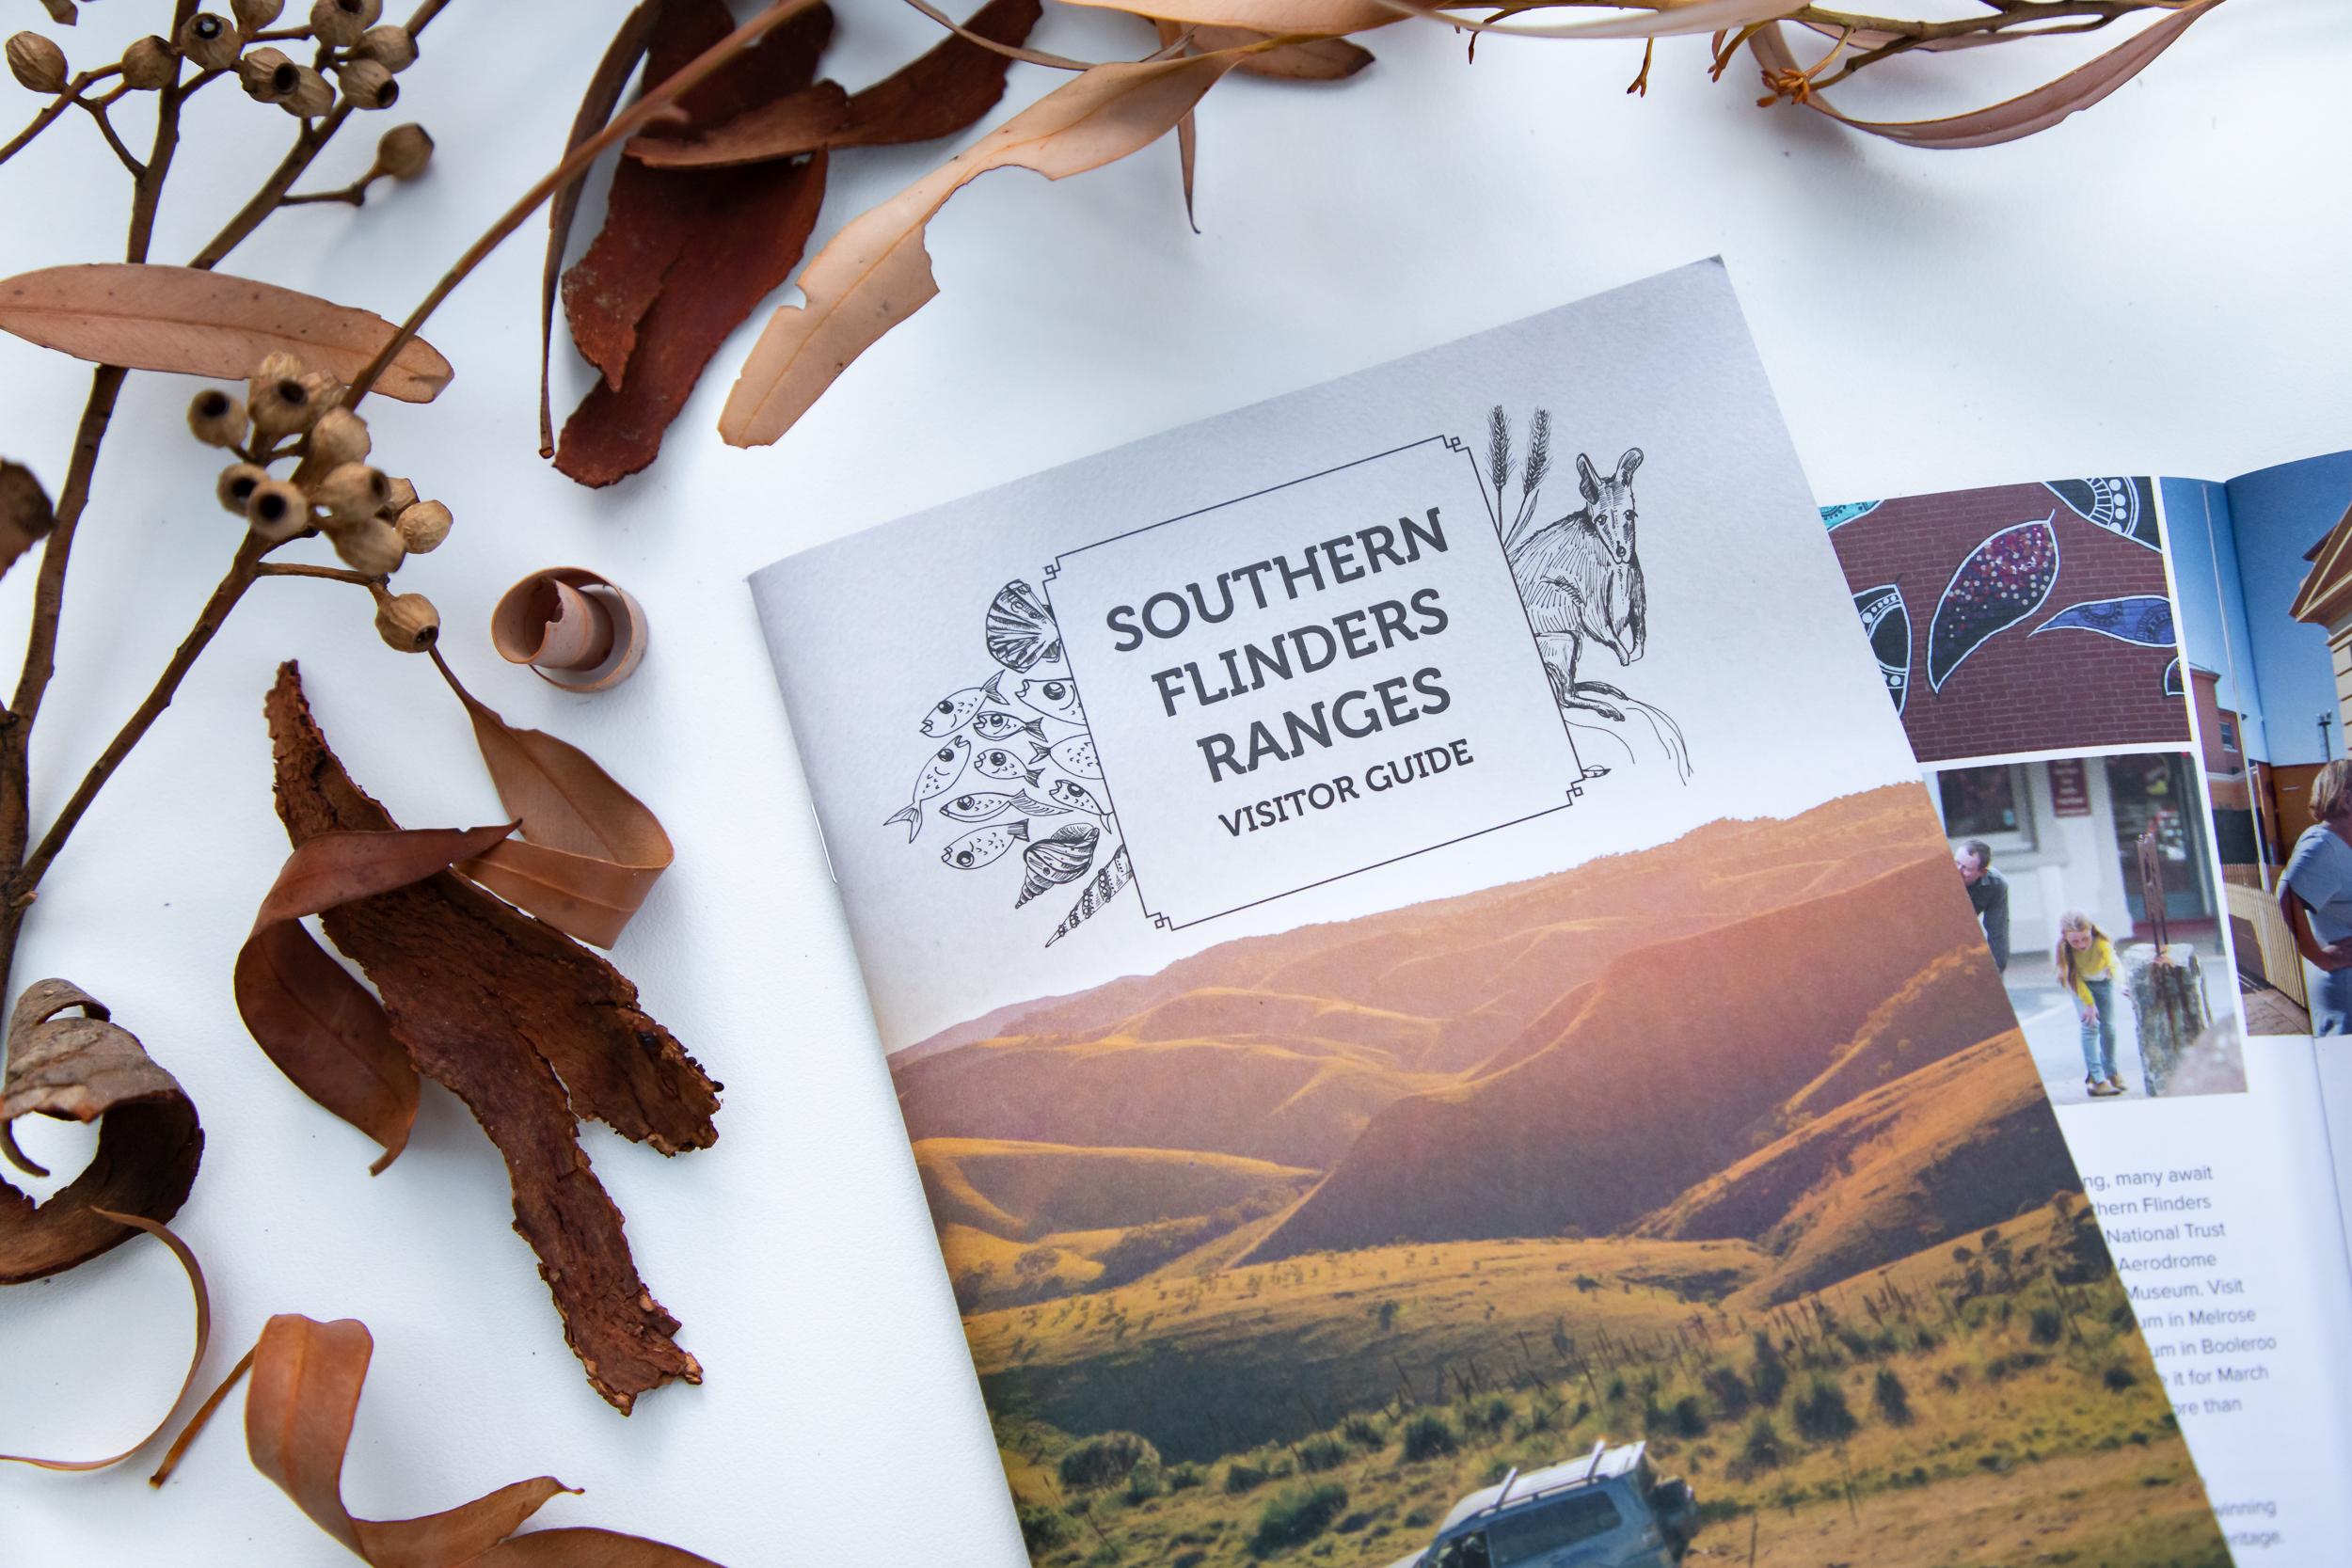 Southern Flinders Ranges Visitor Guide